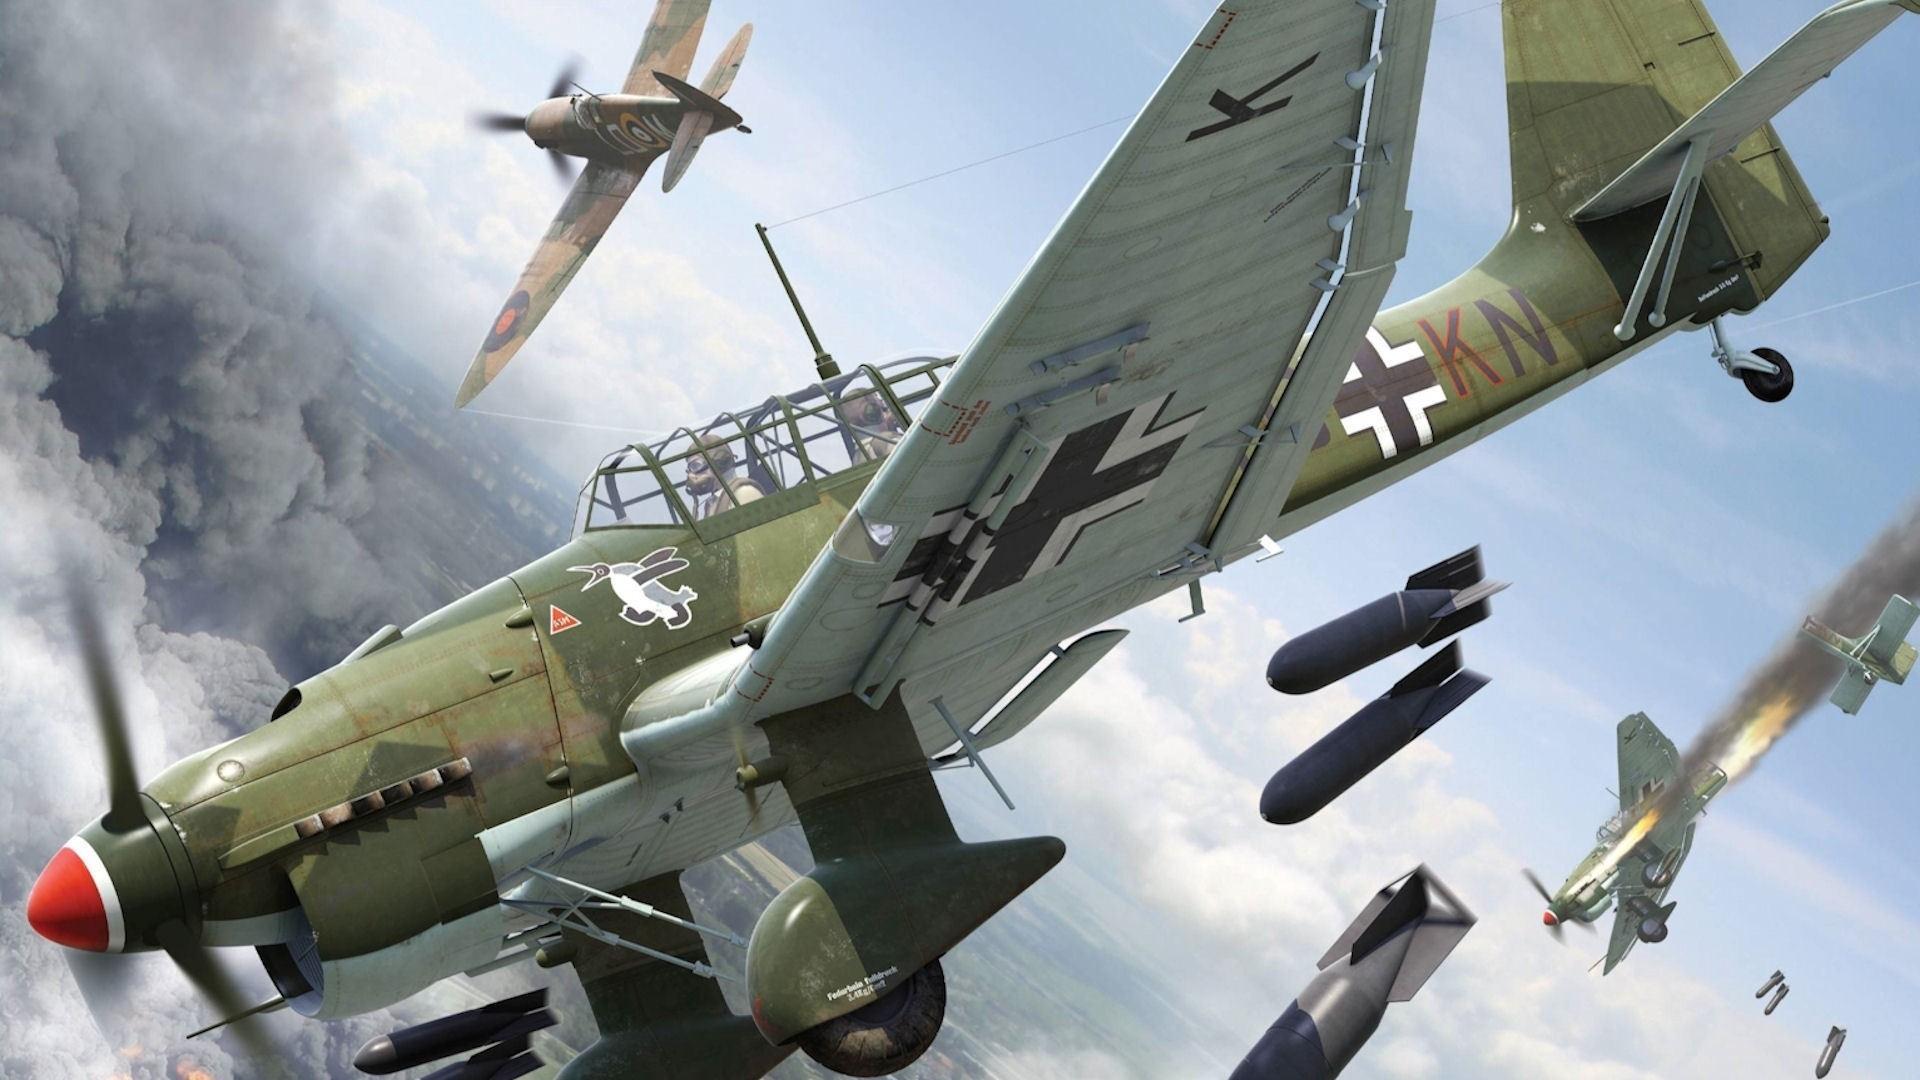 Download Wallpapers, Download airplanes world war ii stuka  supermarine spitfire jetfire junkers ju87 stuka